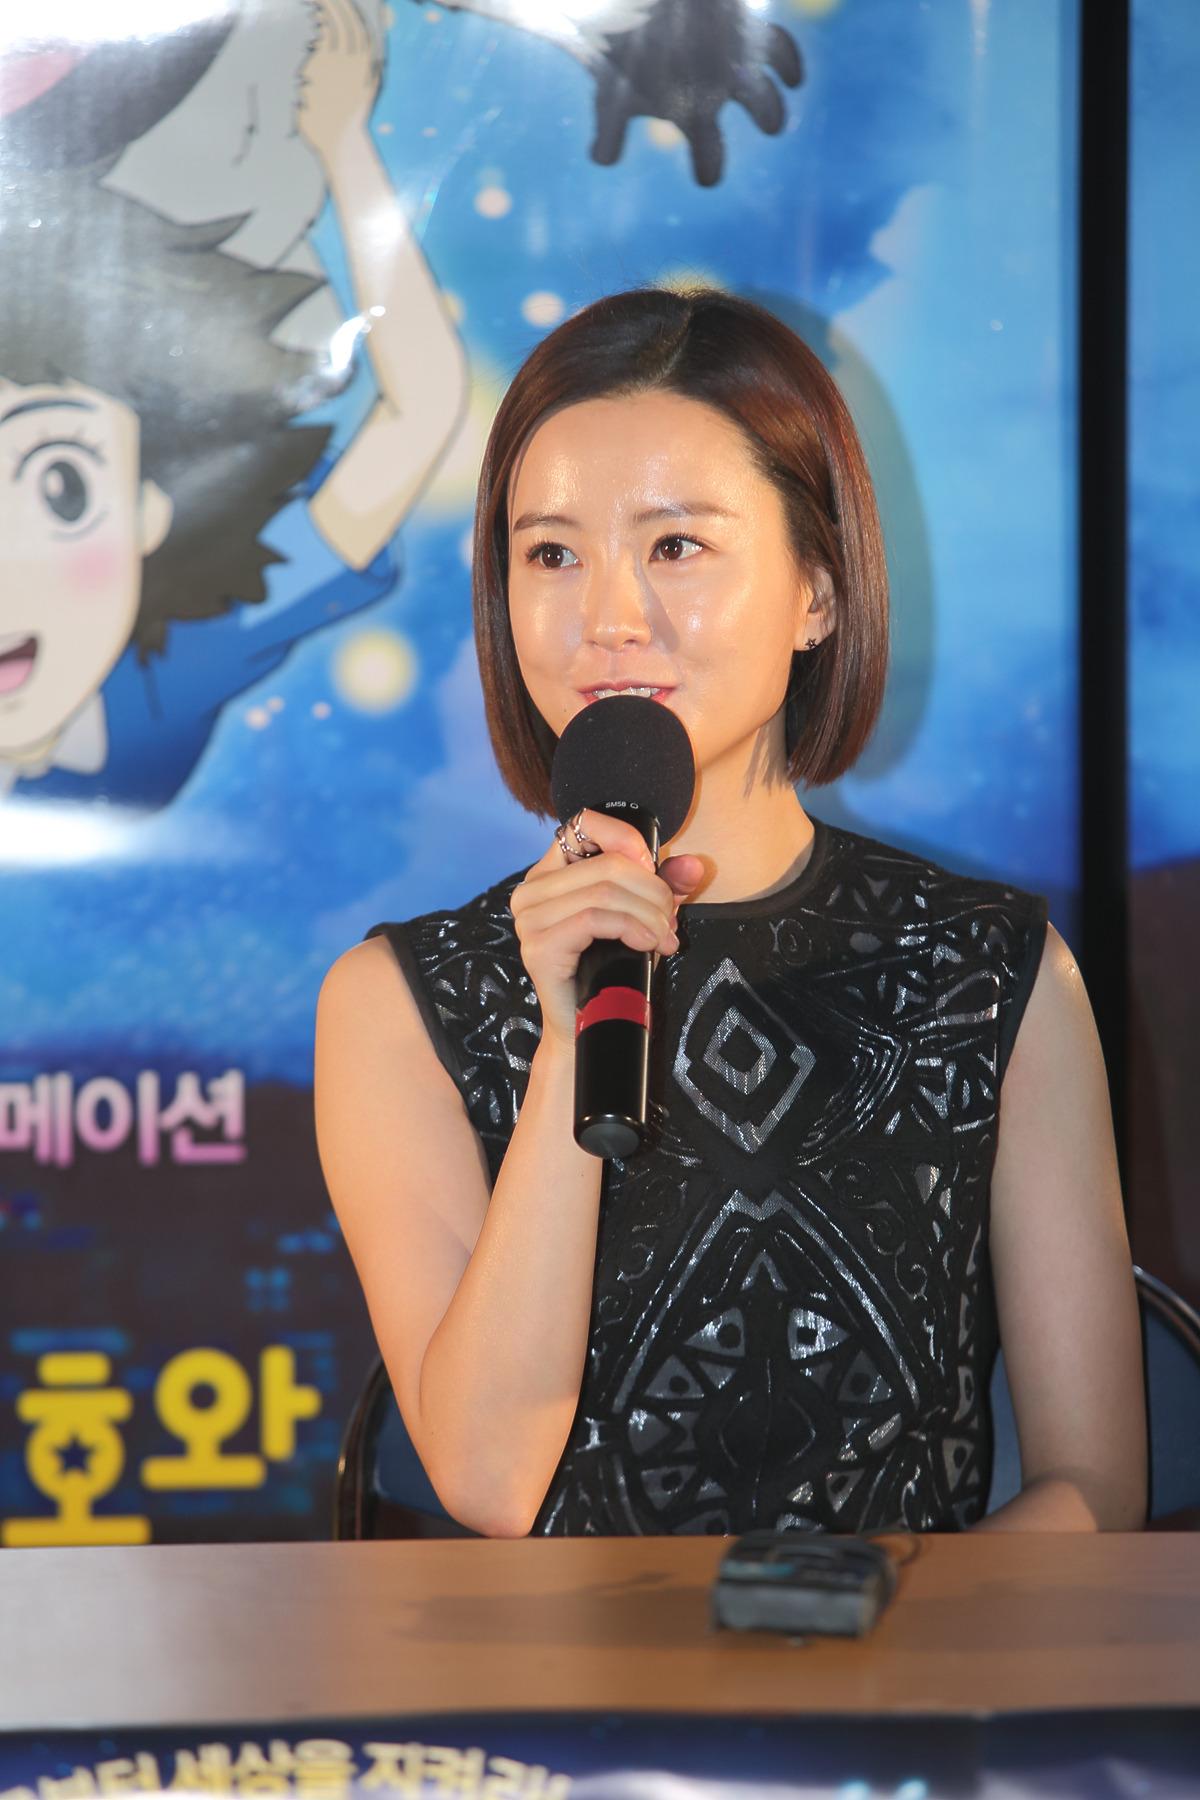 Jung Yu-mi at an event for Uribyeol Ilho-wa Eollukso (2014)